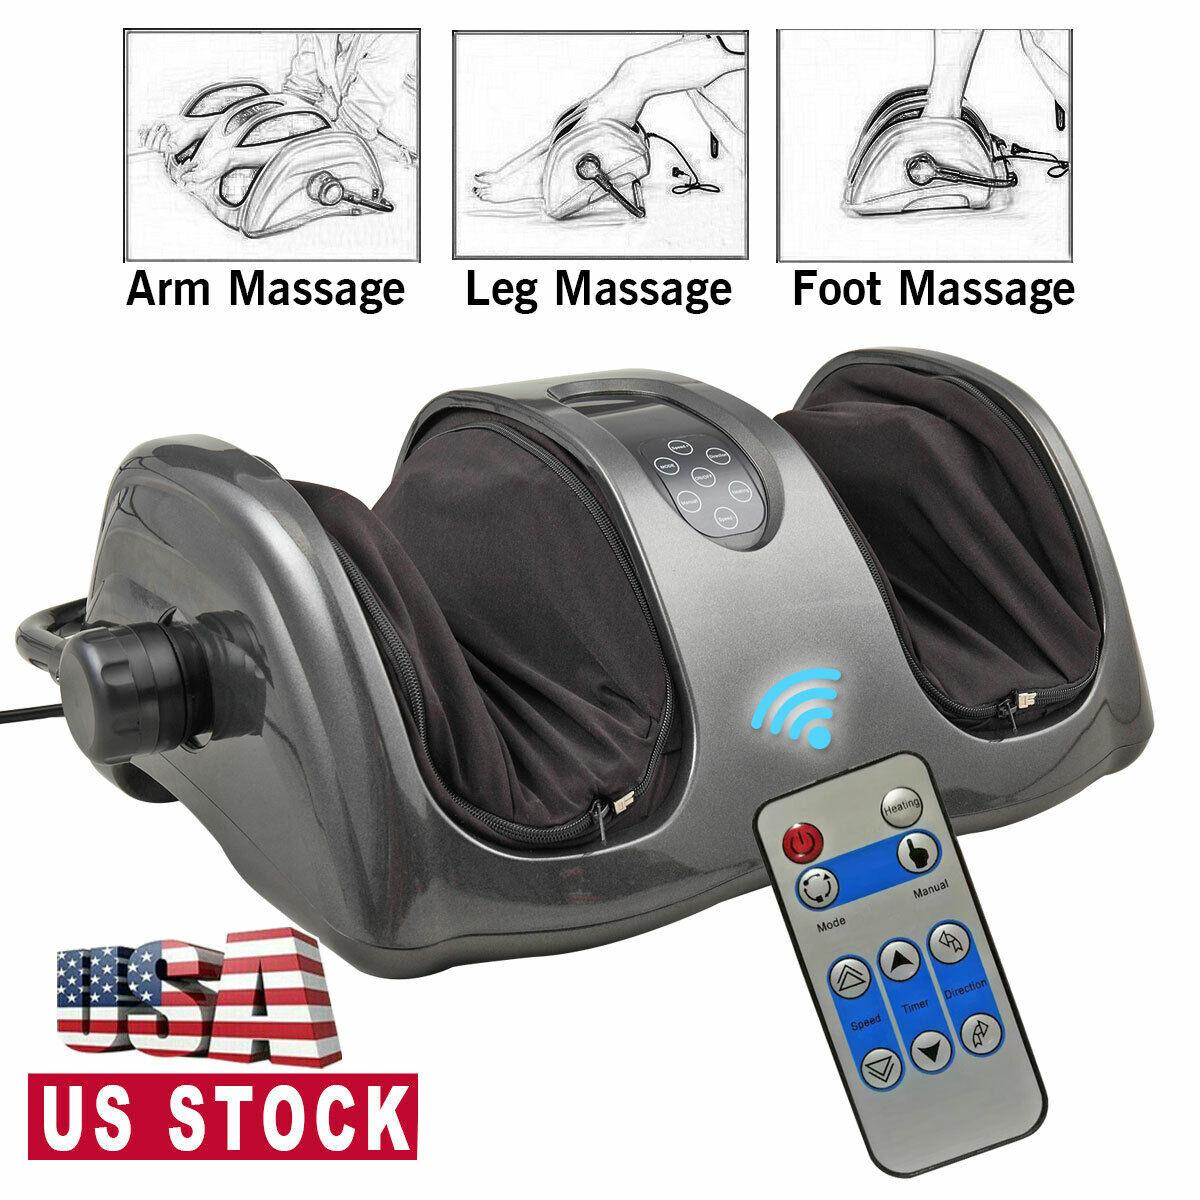 Shiatsu Home Foot Massager Machine With Switchable Kneading